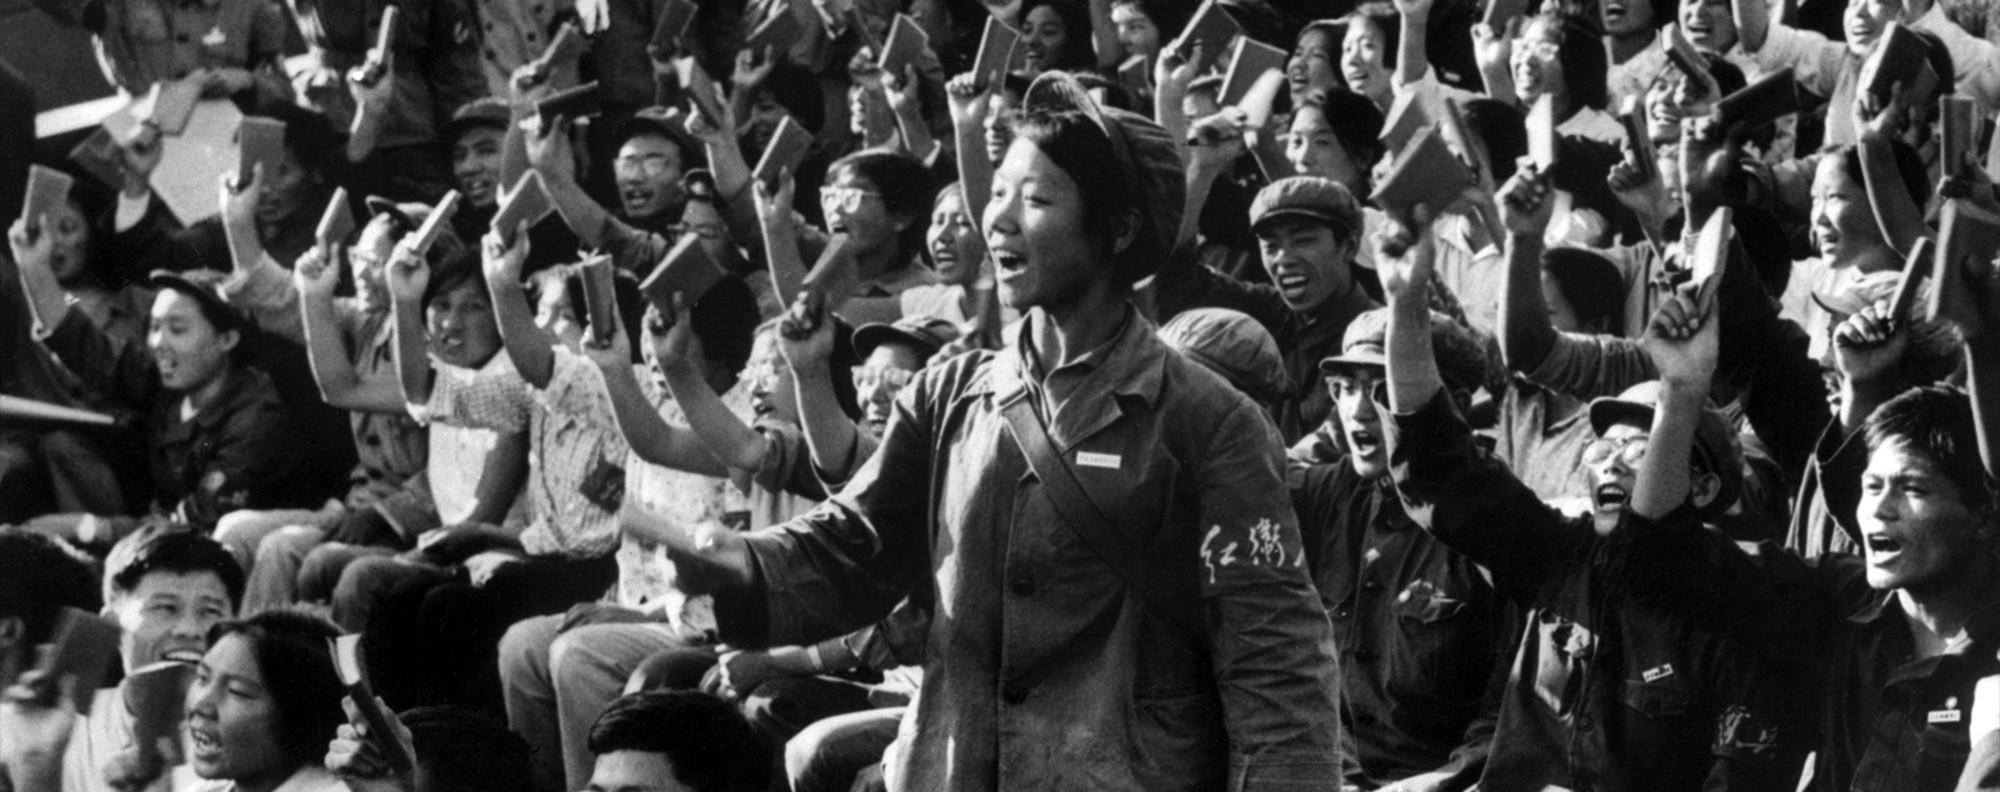 Members of Mao Zedong's Red Guard in Beijing, in 1966. Picture: AFP